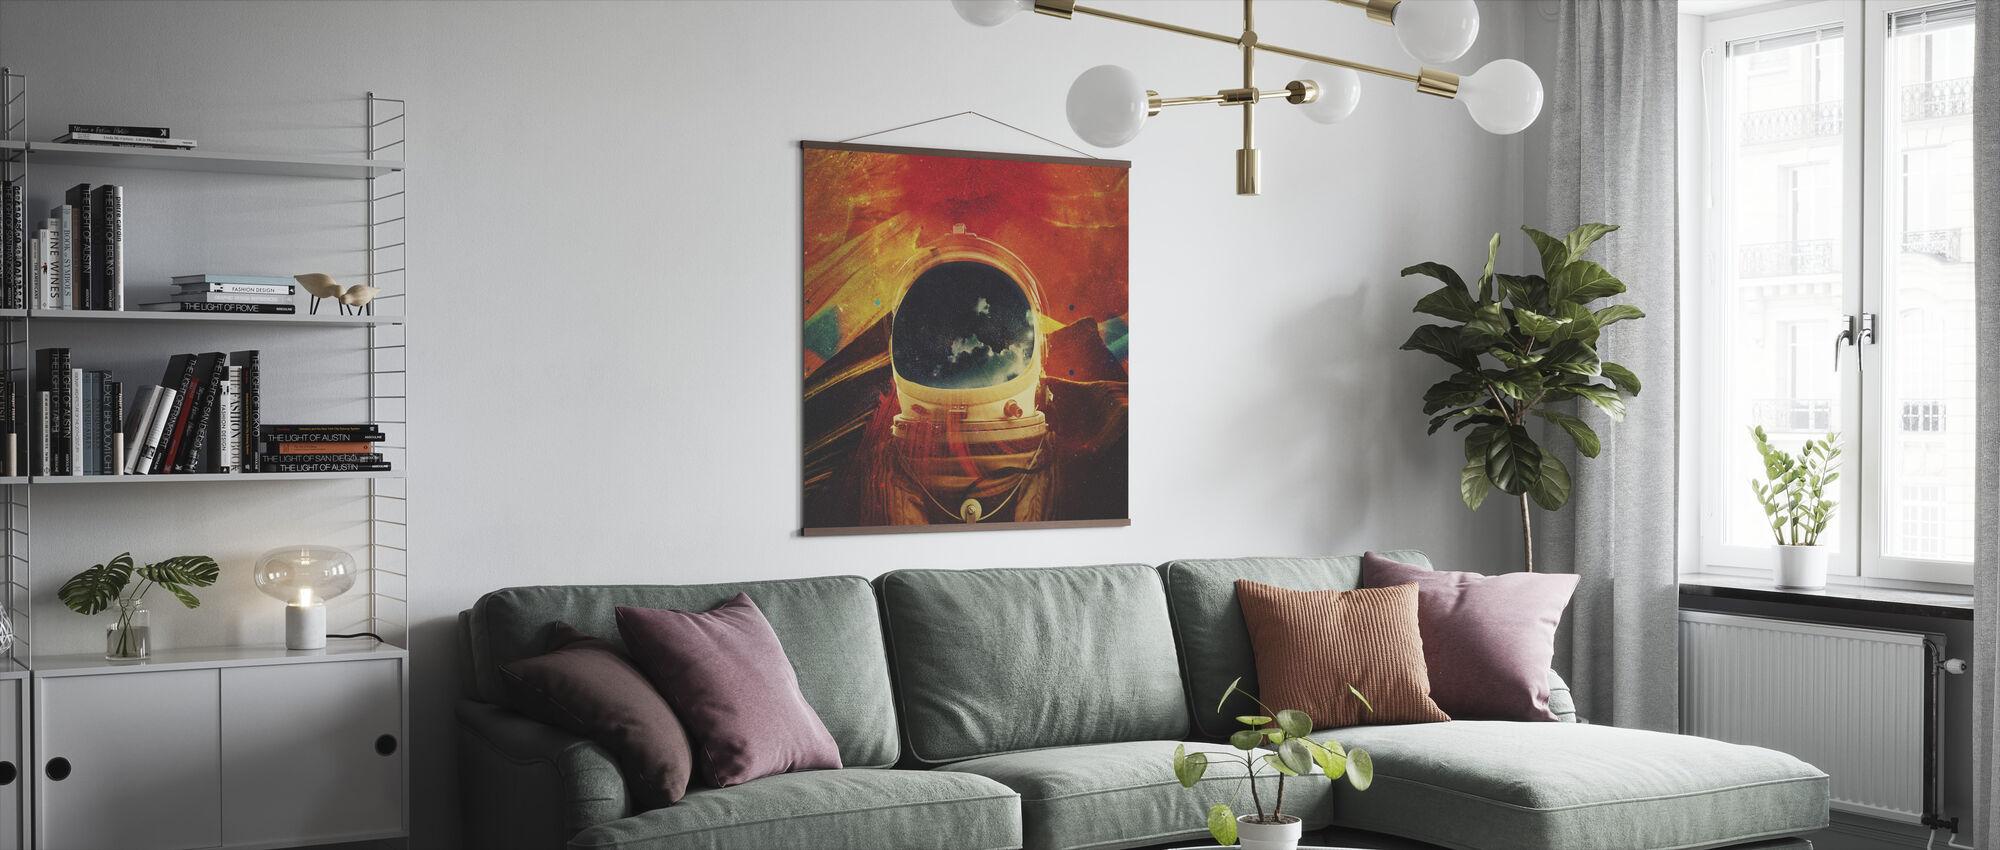 Soulseek - Poster - Living Room